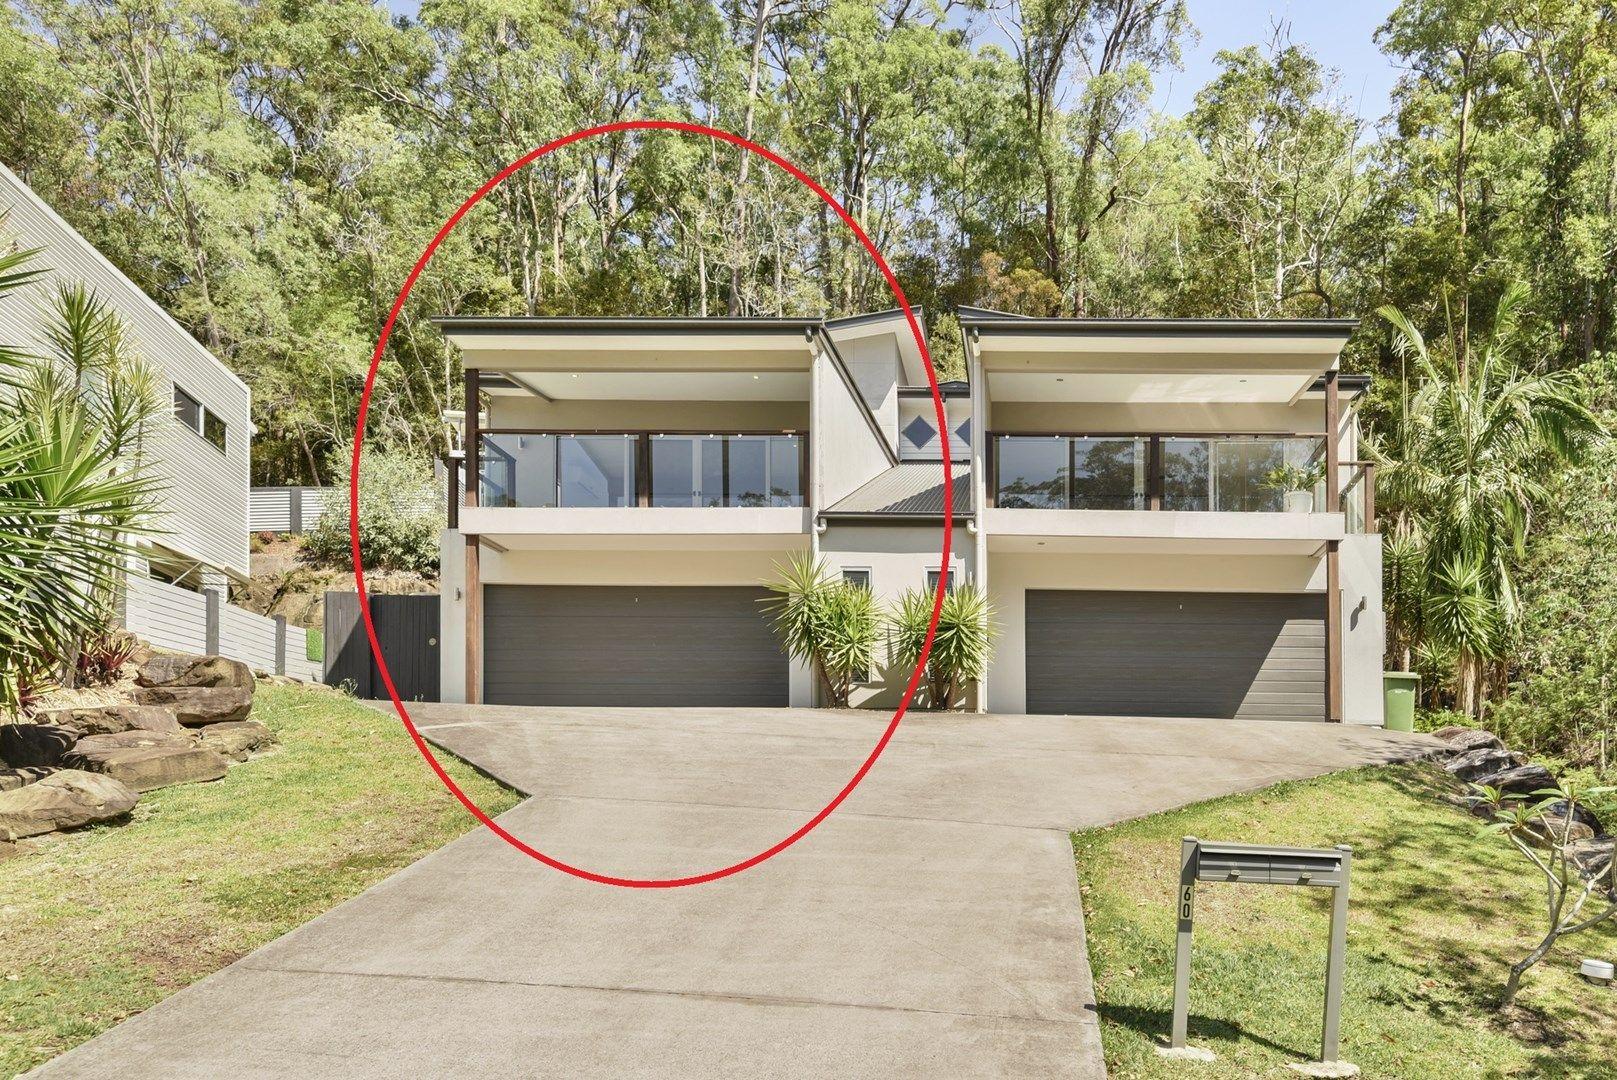 1/60 Martins Creek Road, Buderim QLD 4556, Image 0